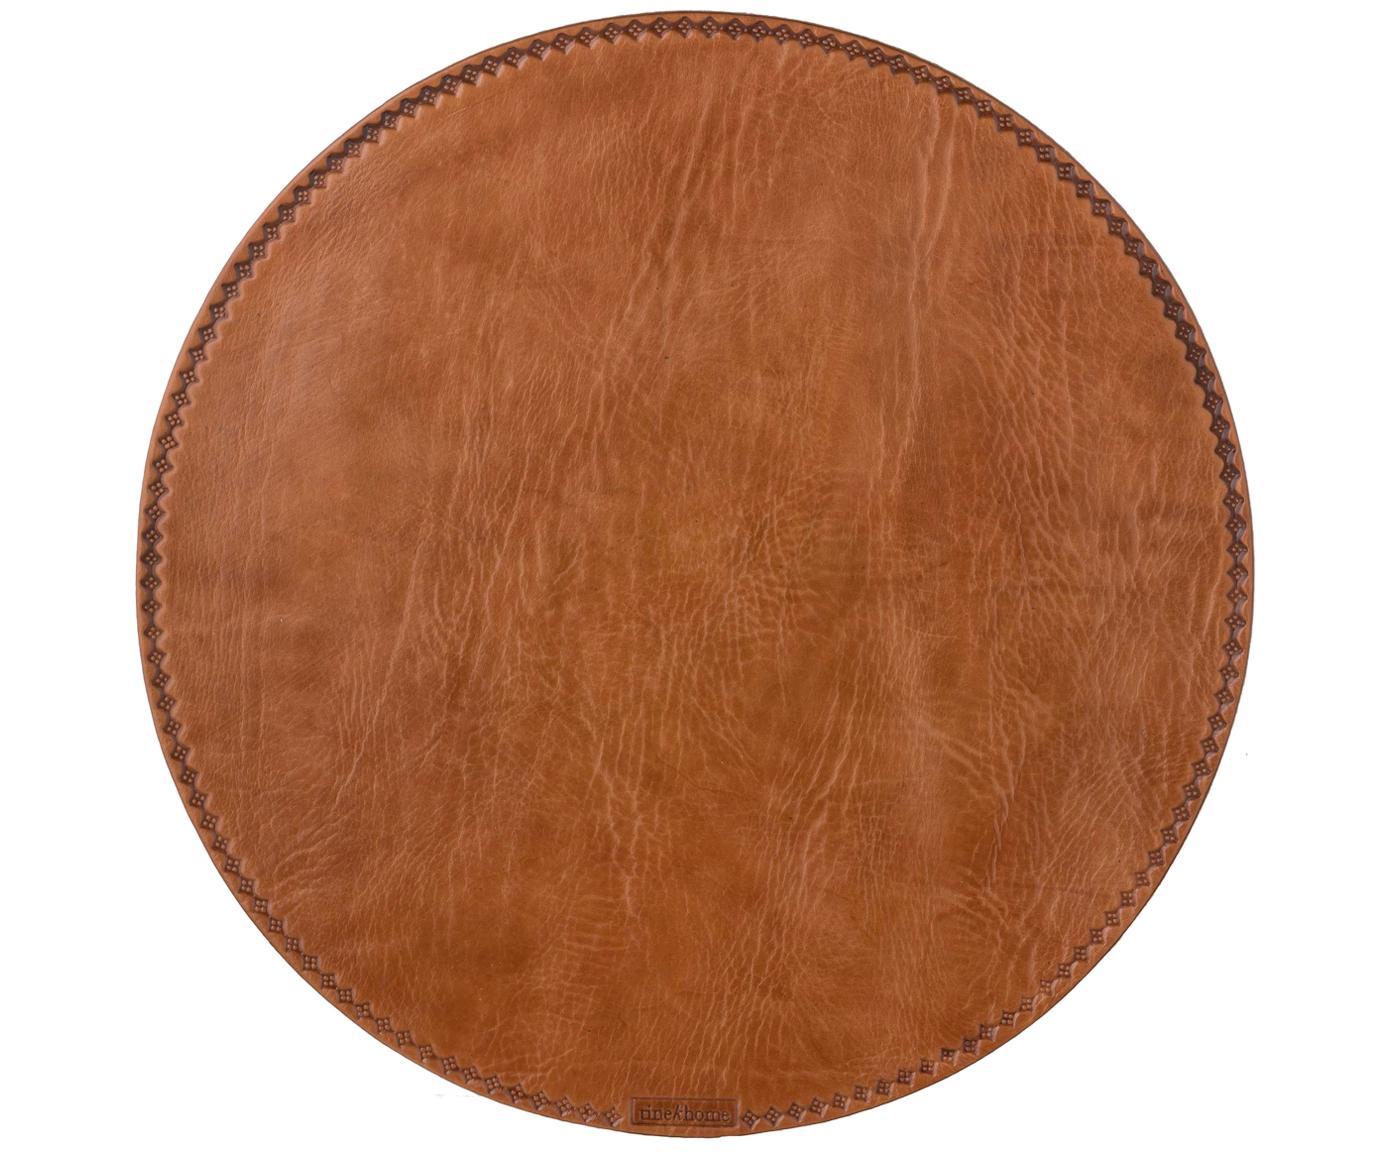 Bolvormige leer placemat Lia, Bruin, Ø 40 cm